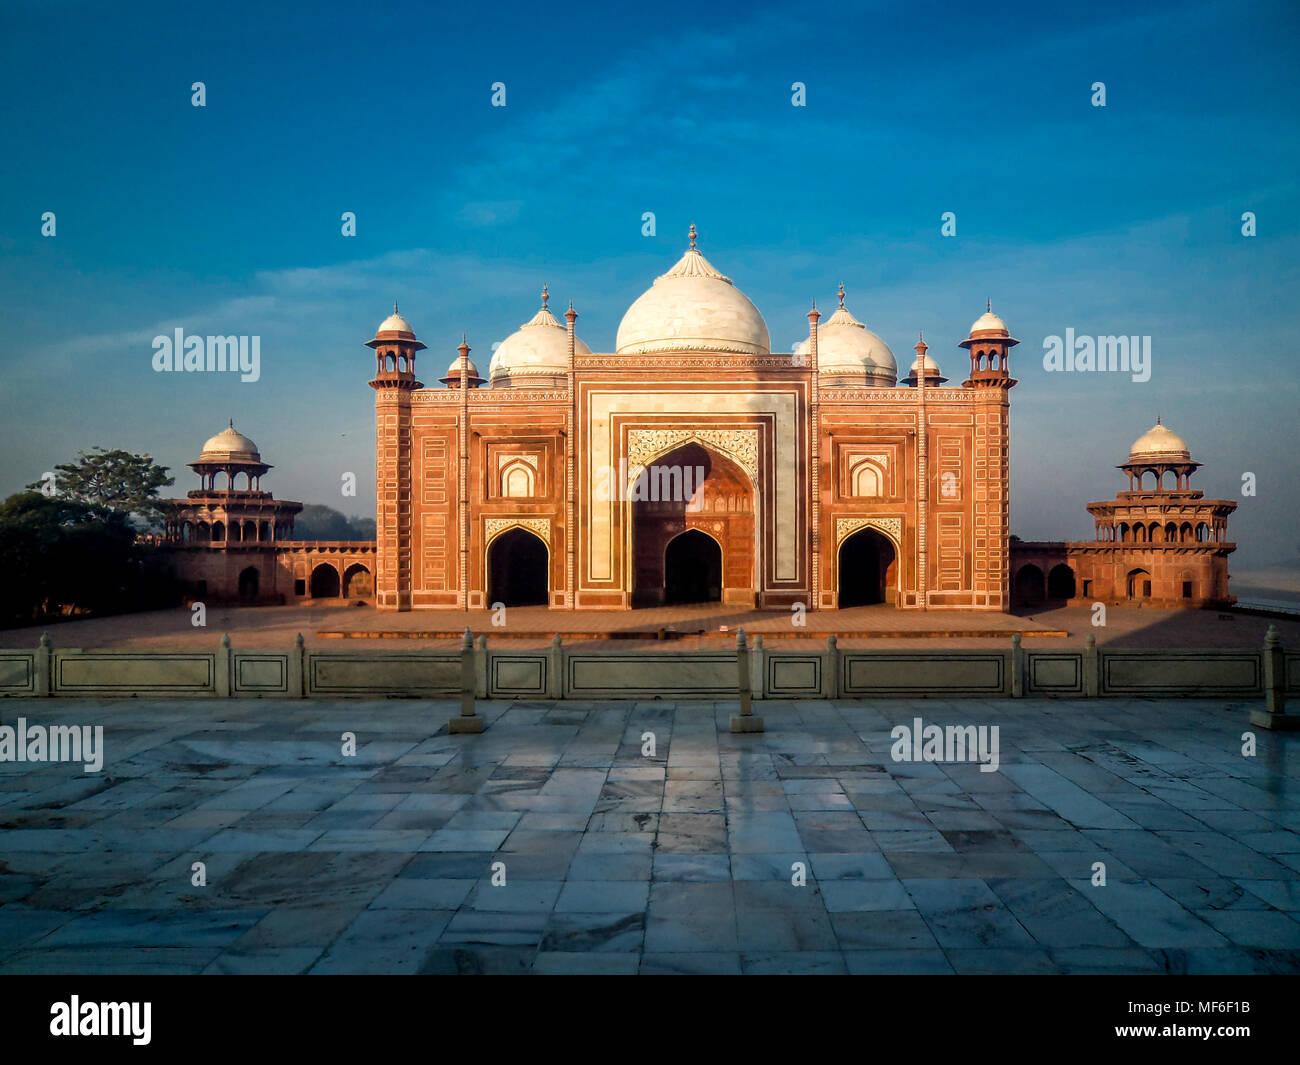 Die Moschee im Taj Mahal, Agra, Indien Stockbild